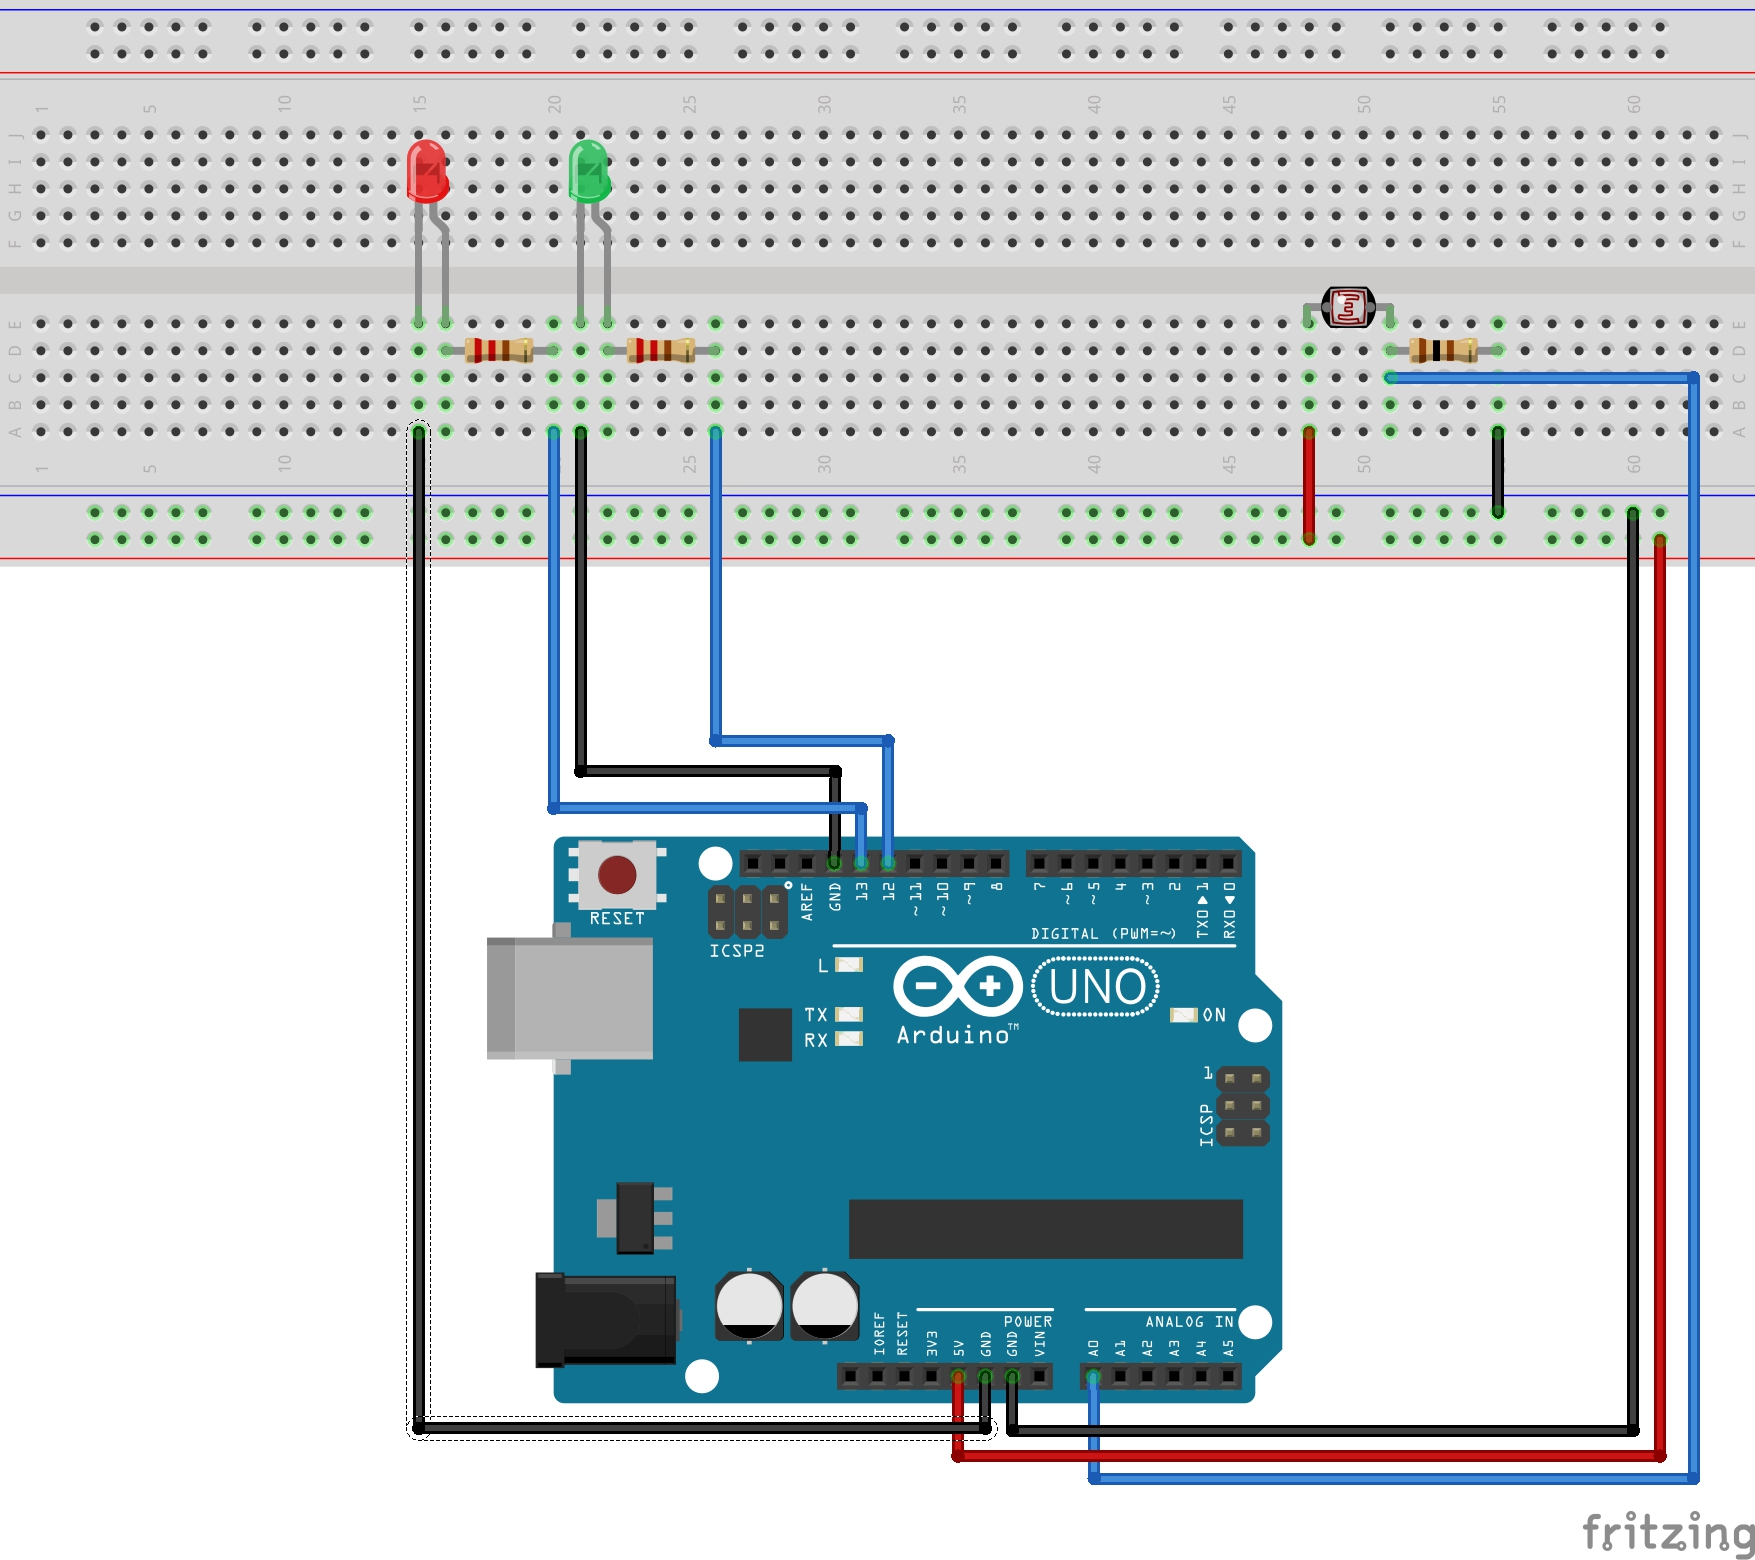 Ambient Light Sensor Using Photo Resistor and LED Lights! - Hackster.io